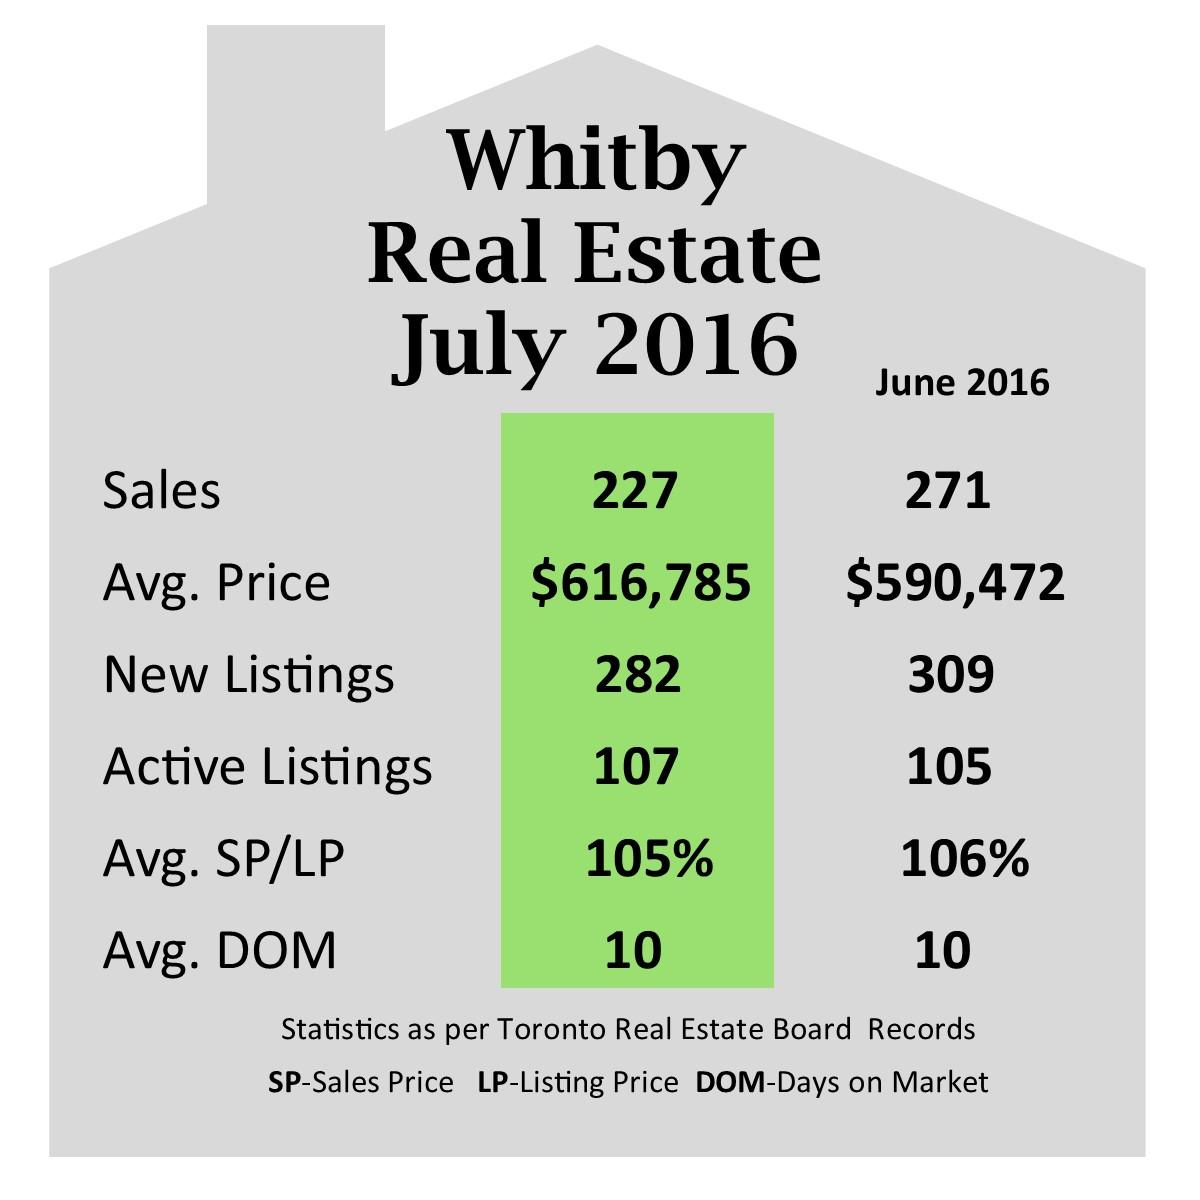 Whitby_July_2016.jpg